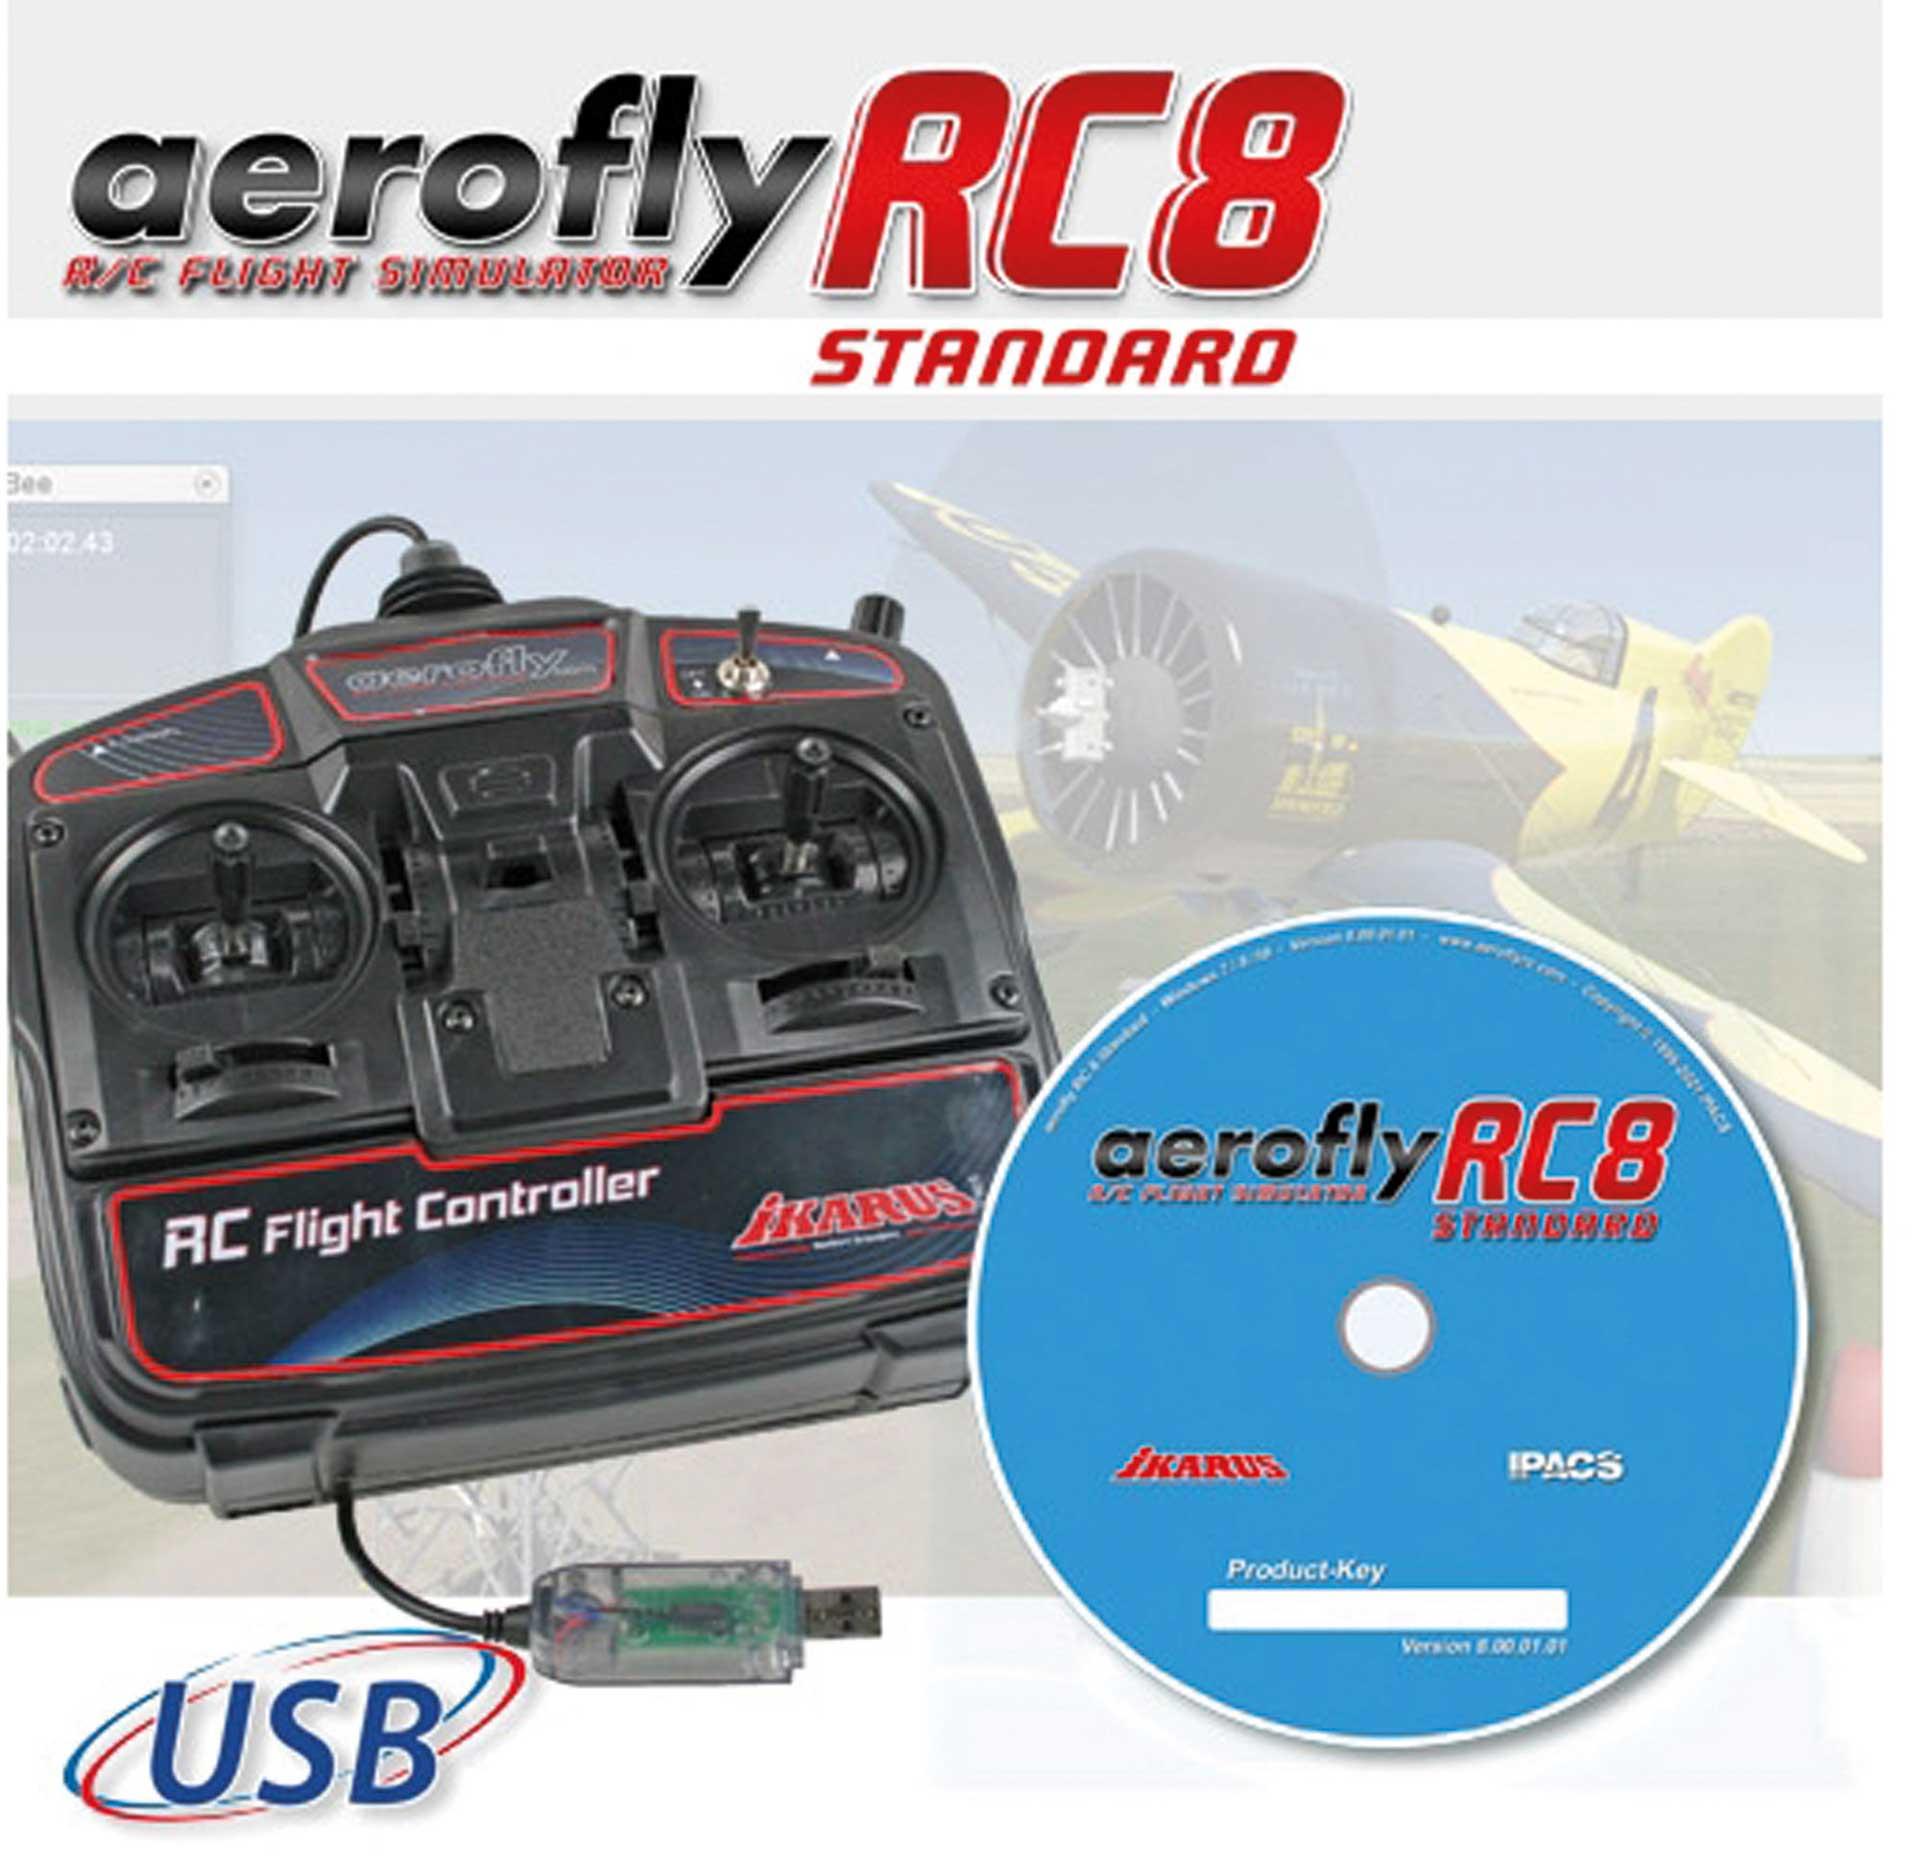 IKARUS AeroFly RC8 Standard DVD incl. USB Flight-Controller